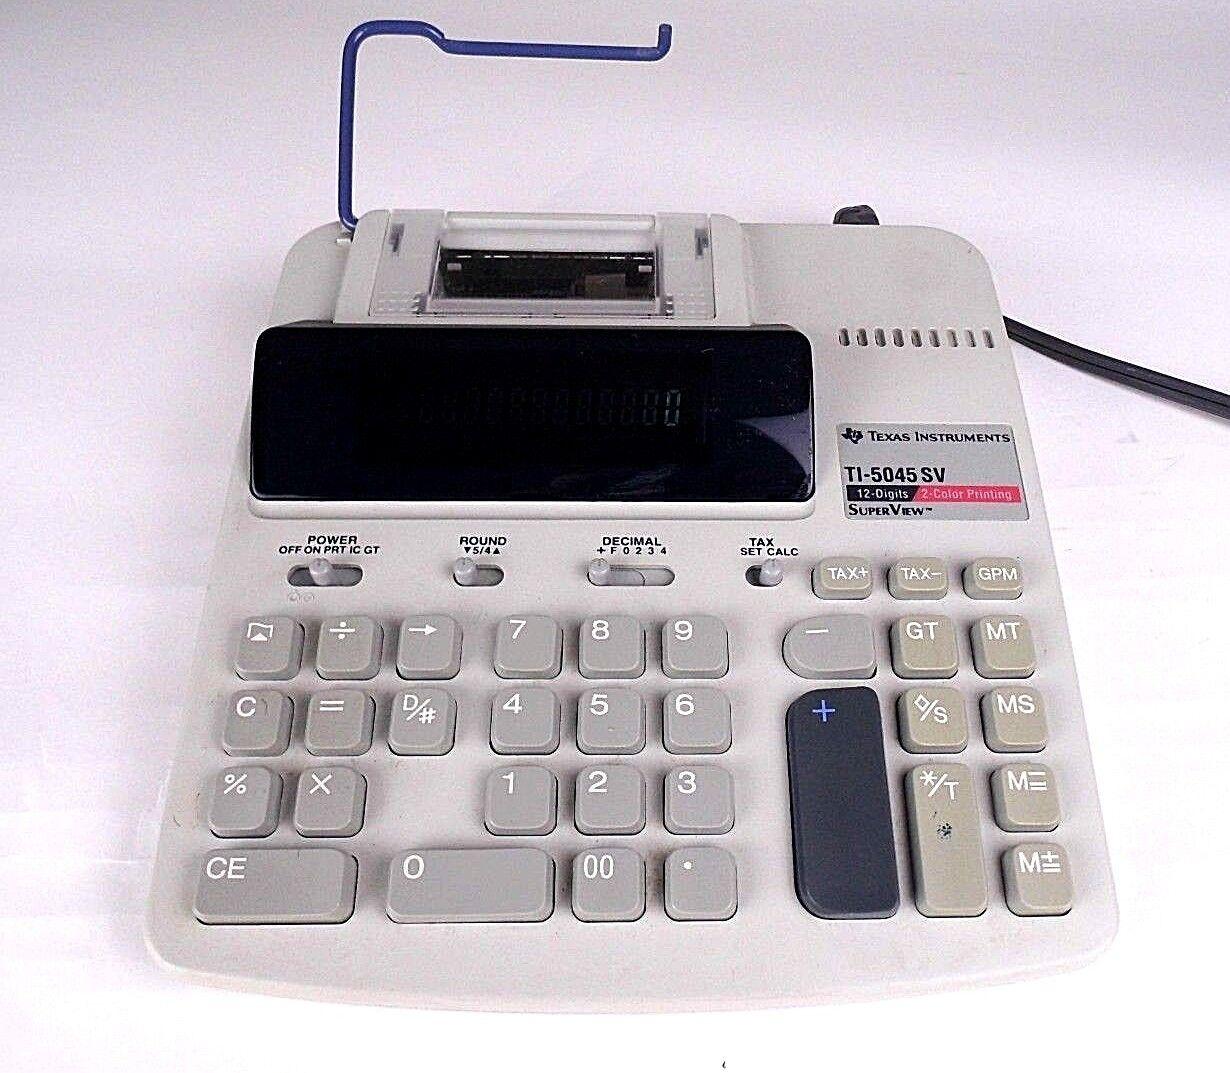 Texas Instruments Electronic Calculator TI-5045 SV - 12 Digits